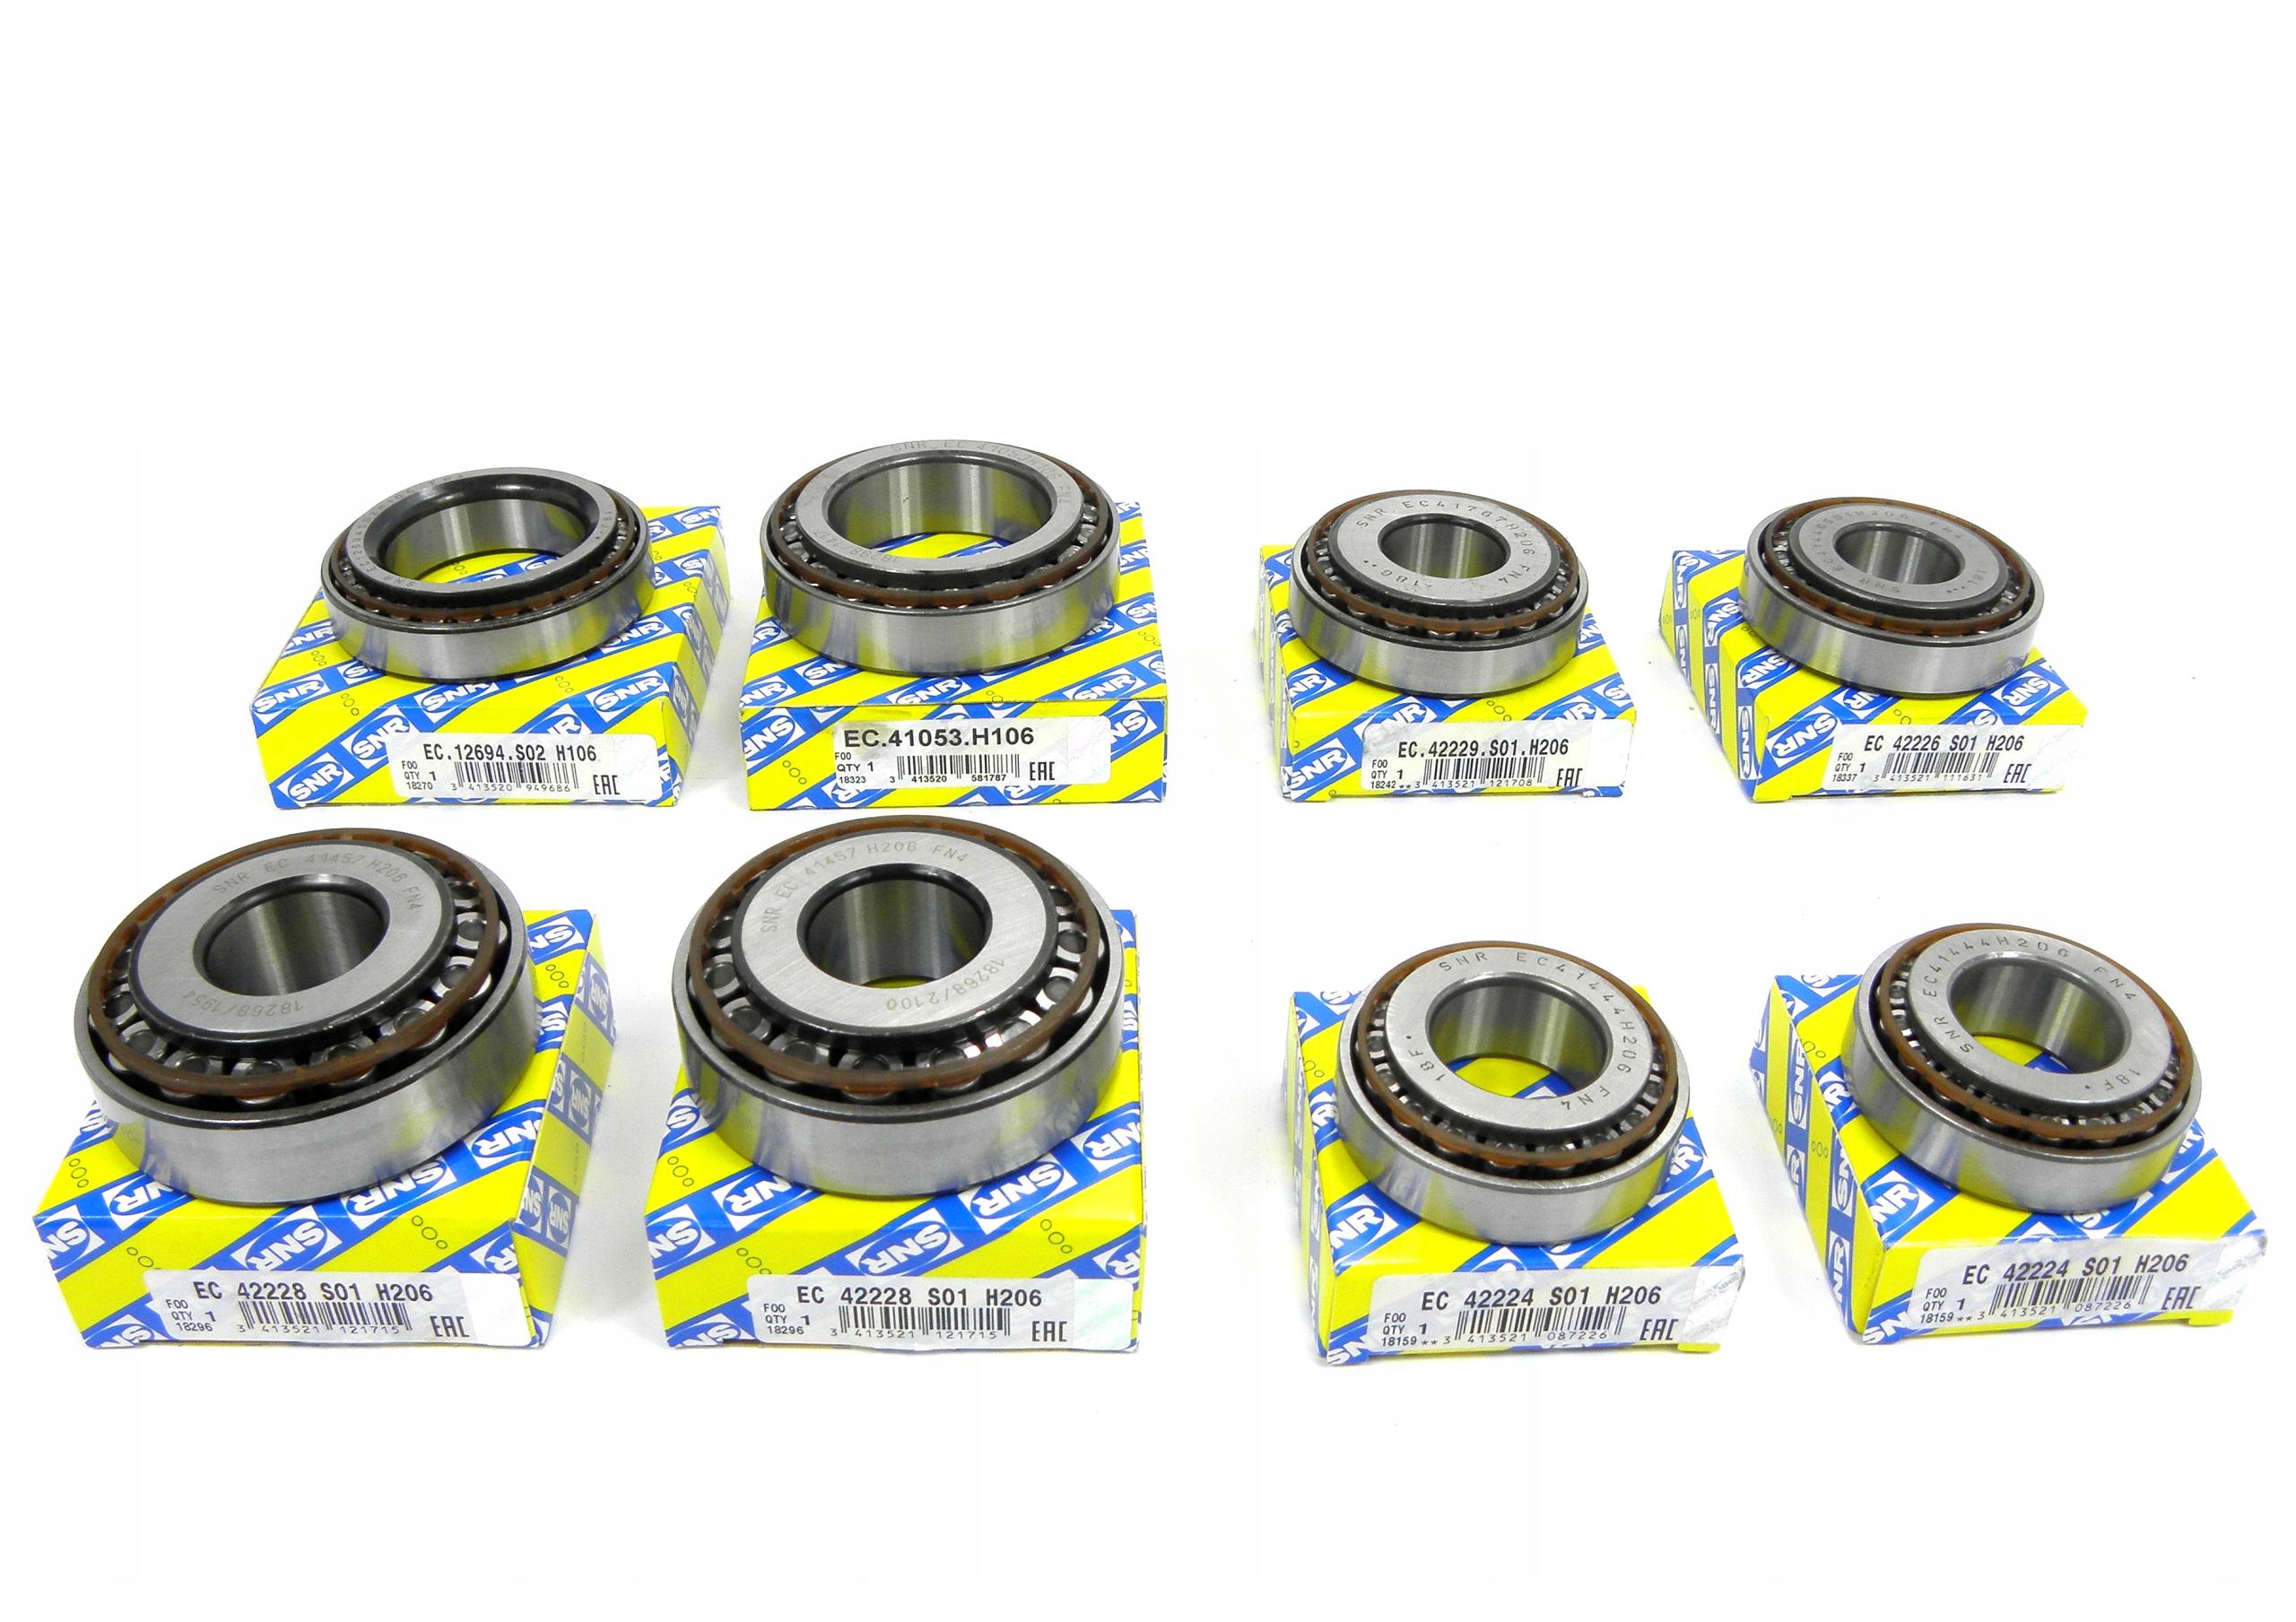 Gearbox Bearing SNR EC 42224 S01 H206